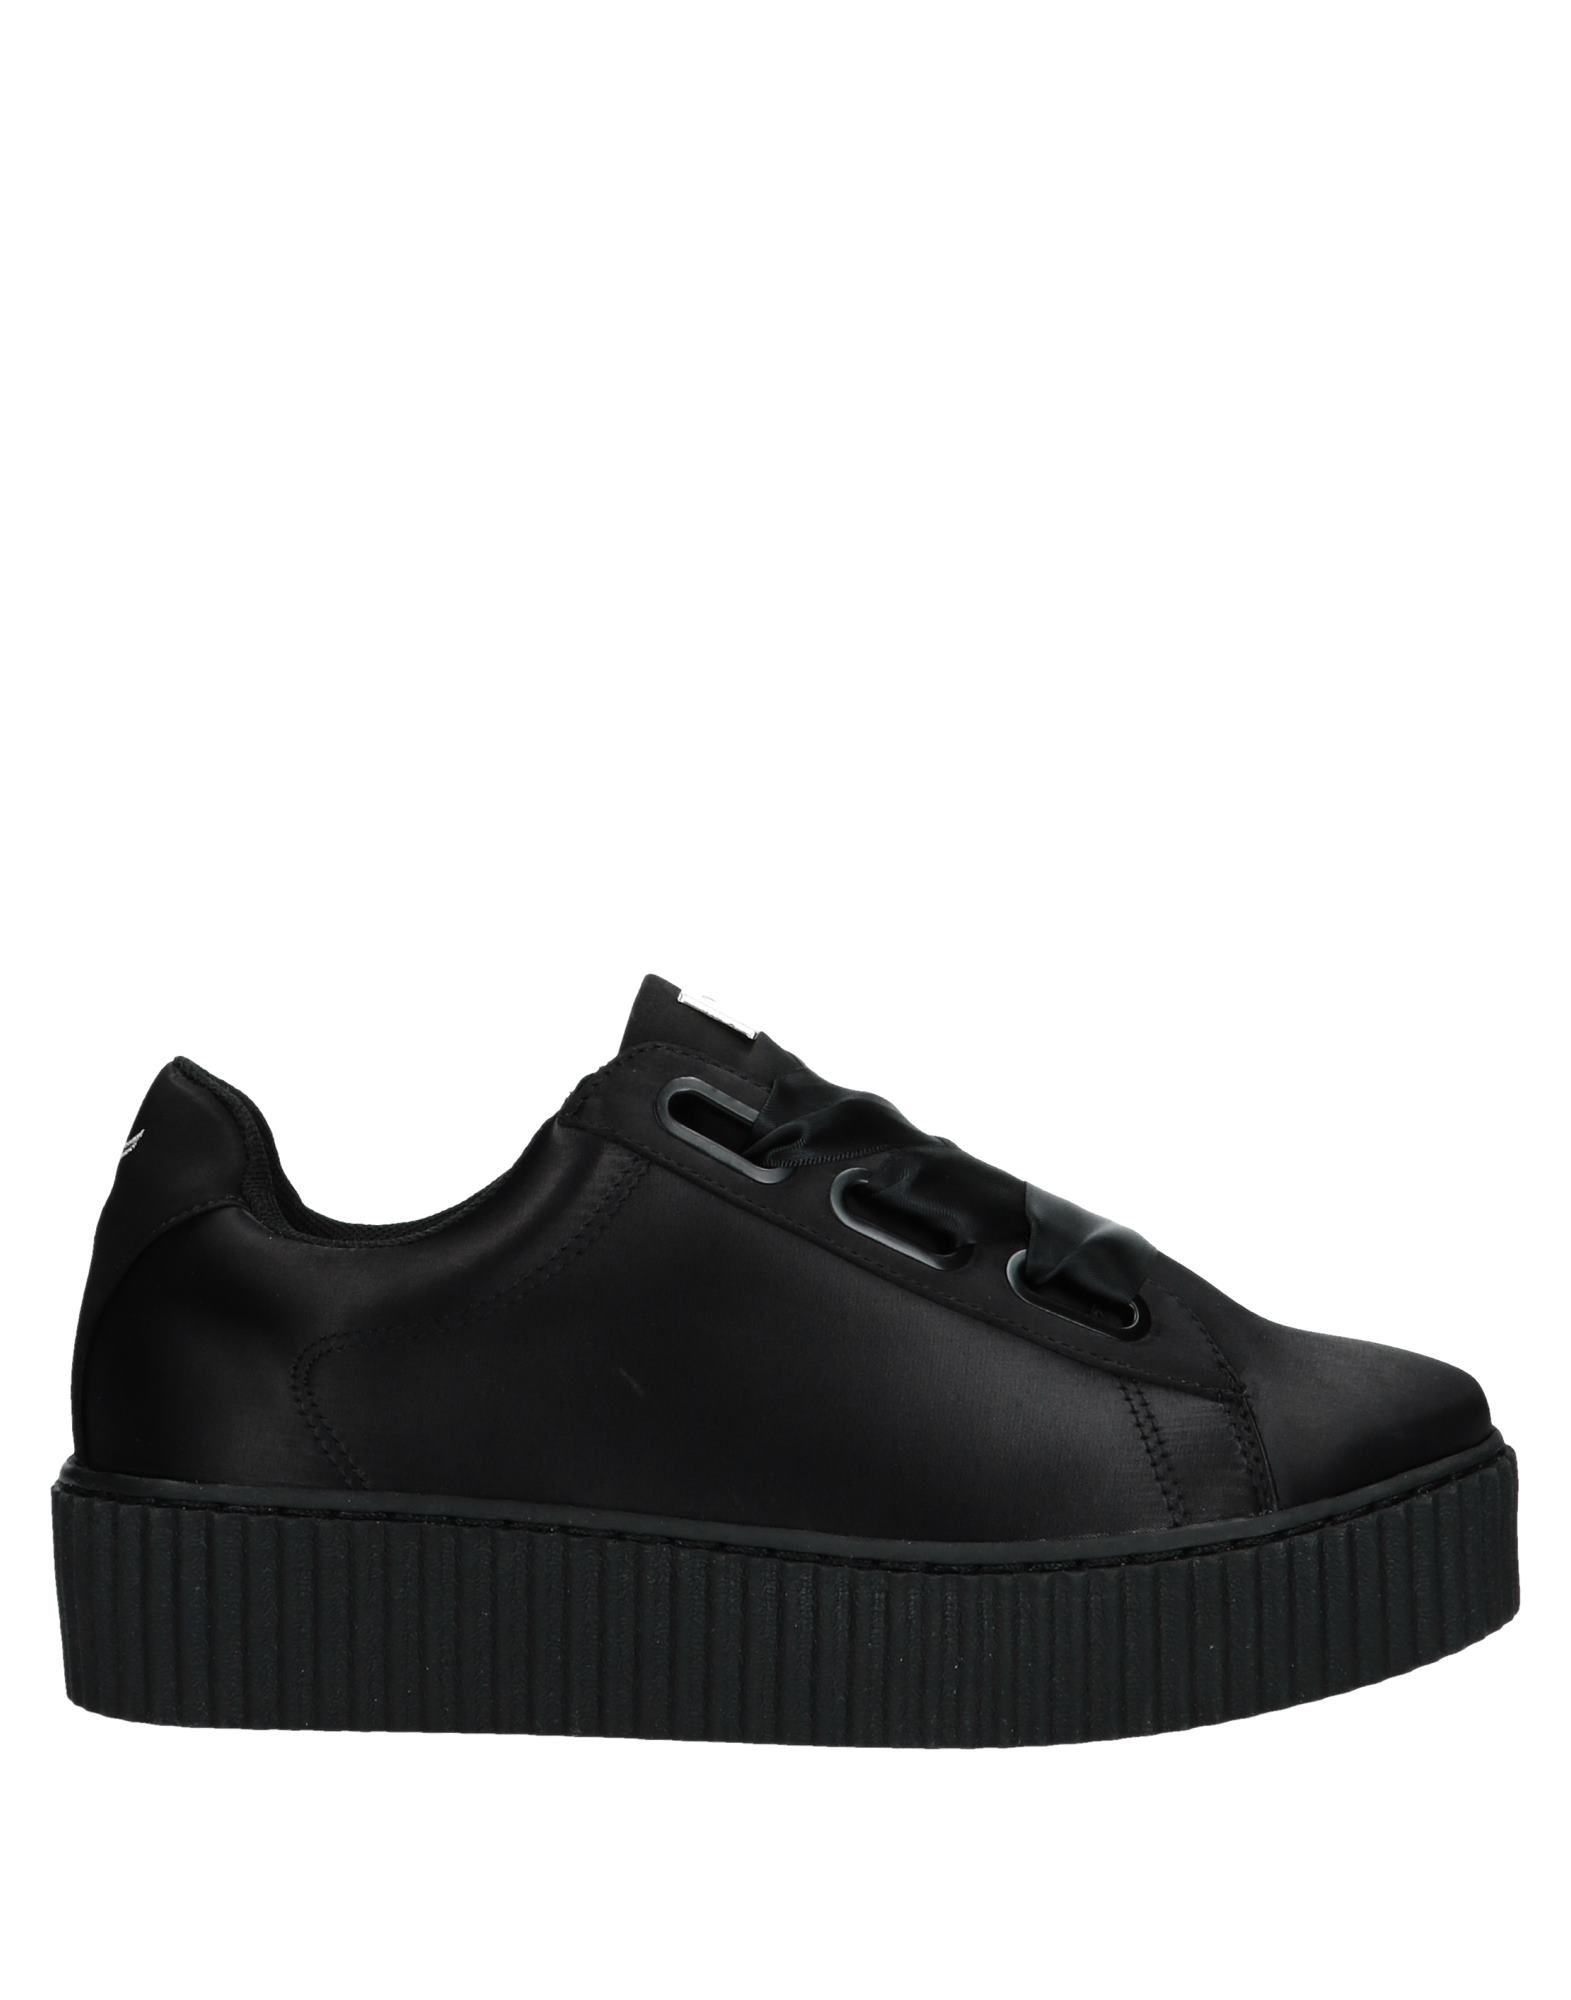 WINDSOR SMITH Низкие кеды и кроссовки кеды кроссовки высокие dc evan smith hi s black gum